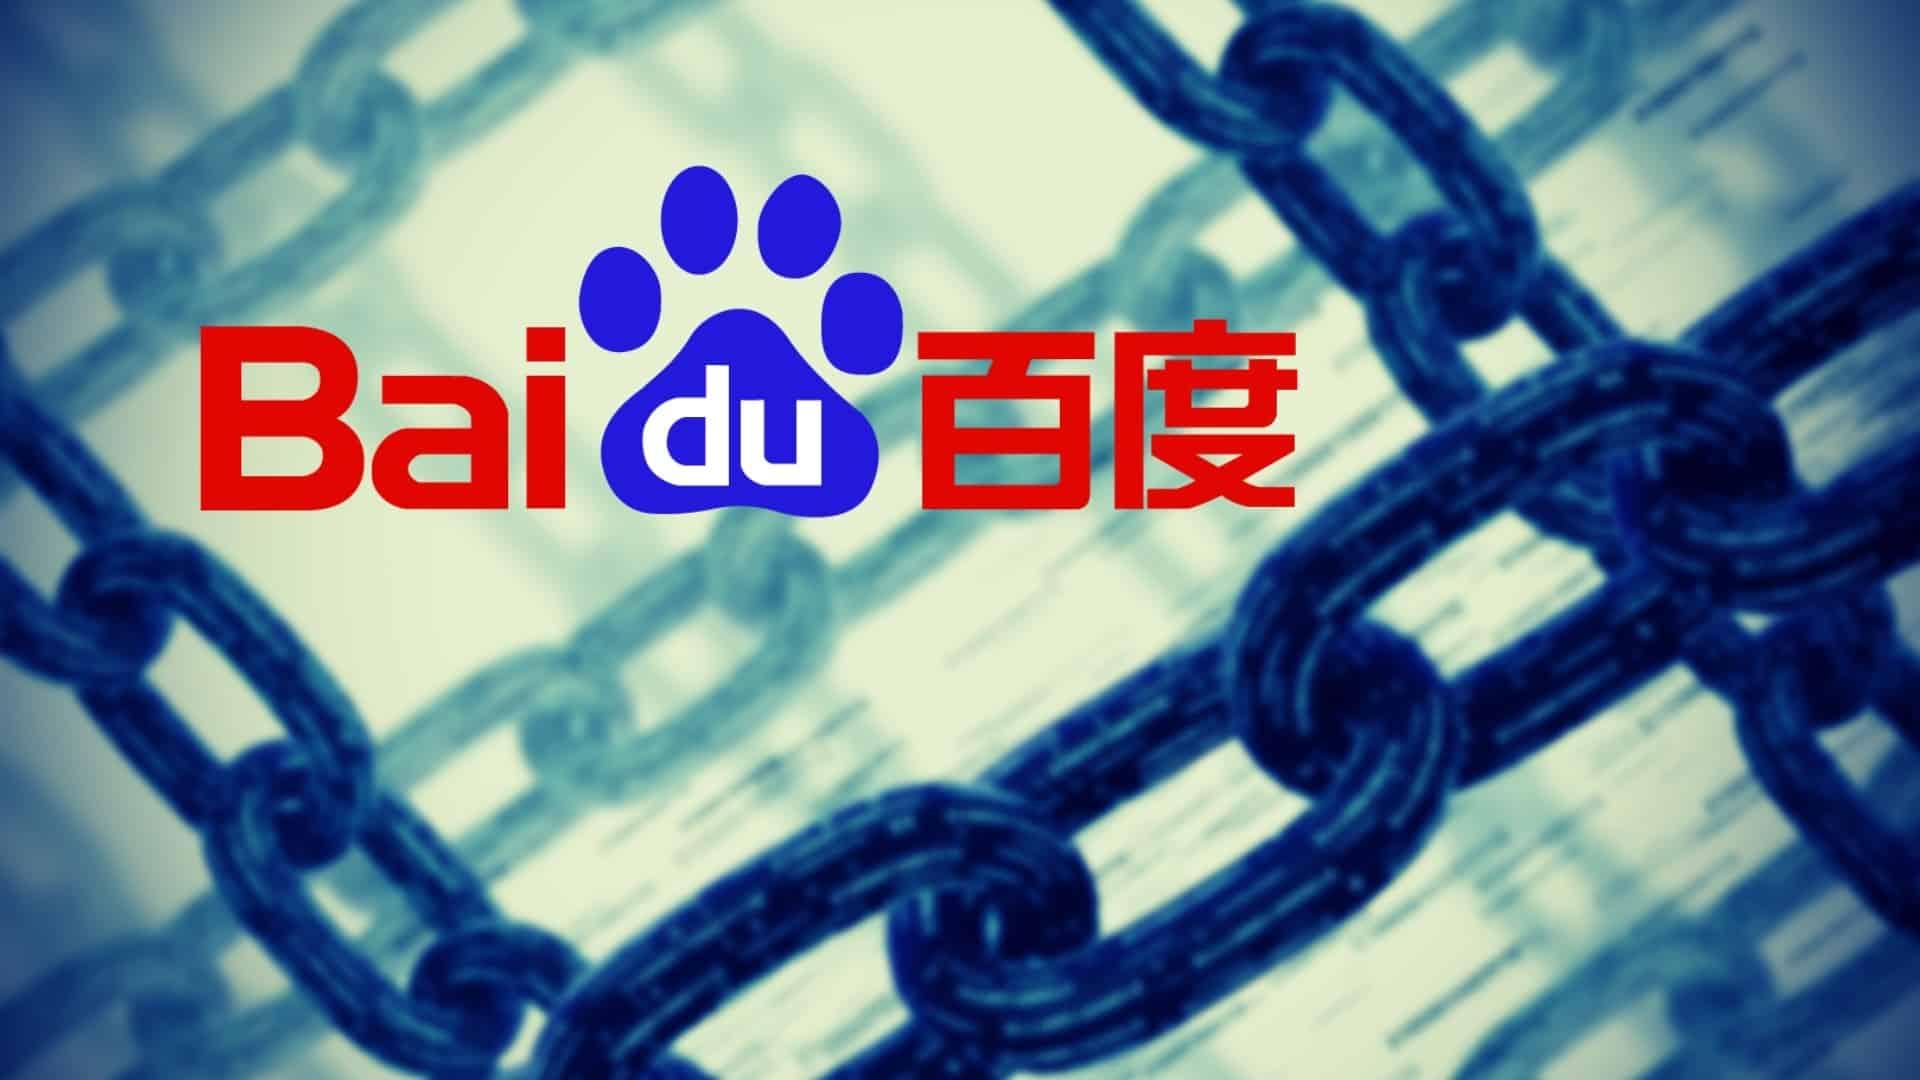 Baidu Launches Beta Version of Xuperchain